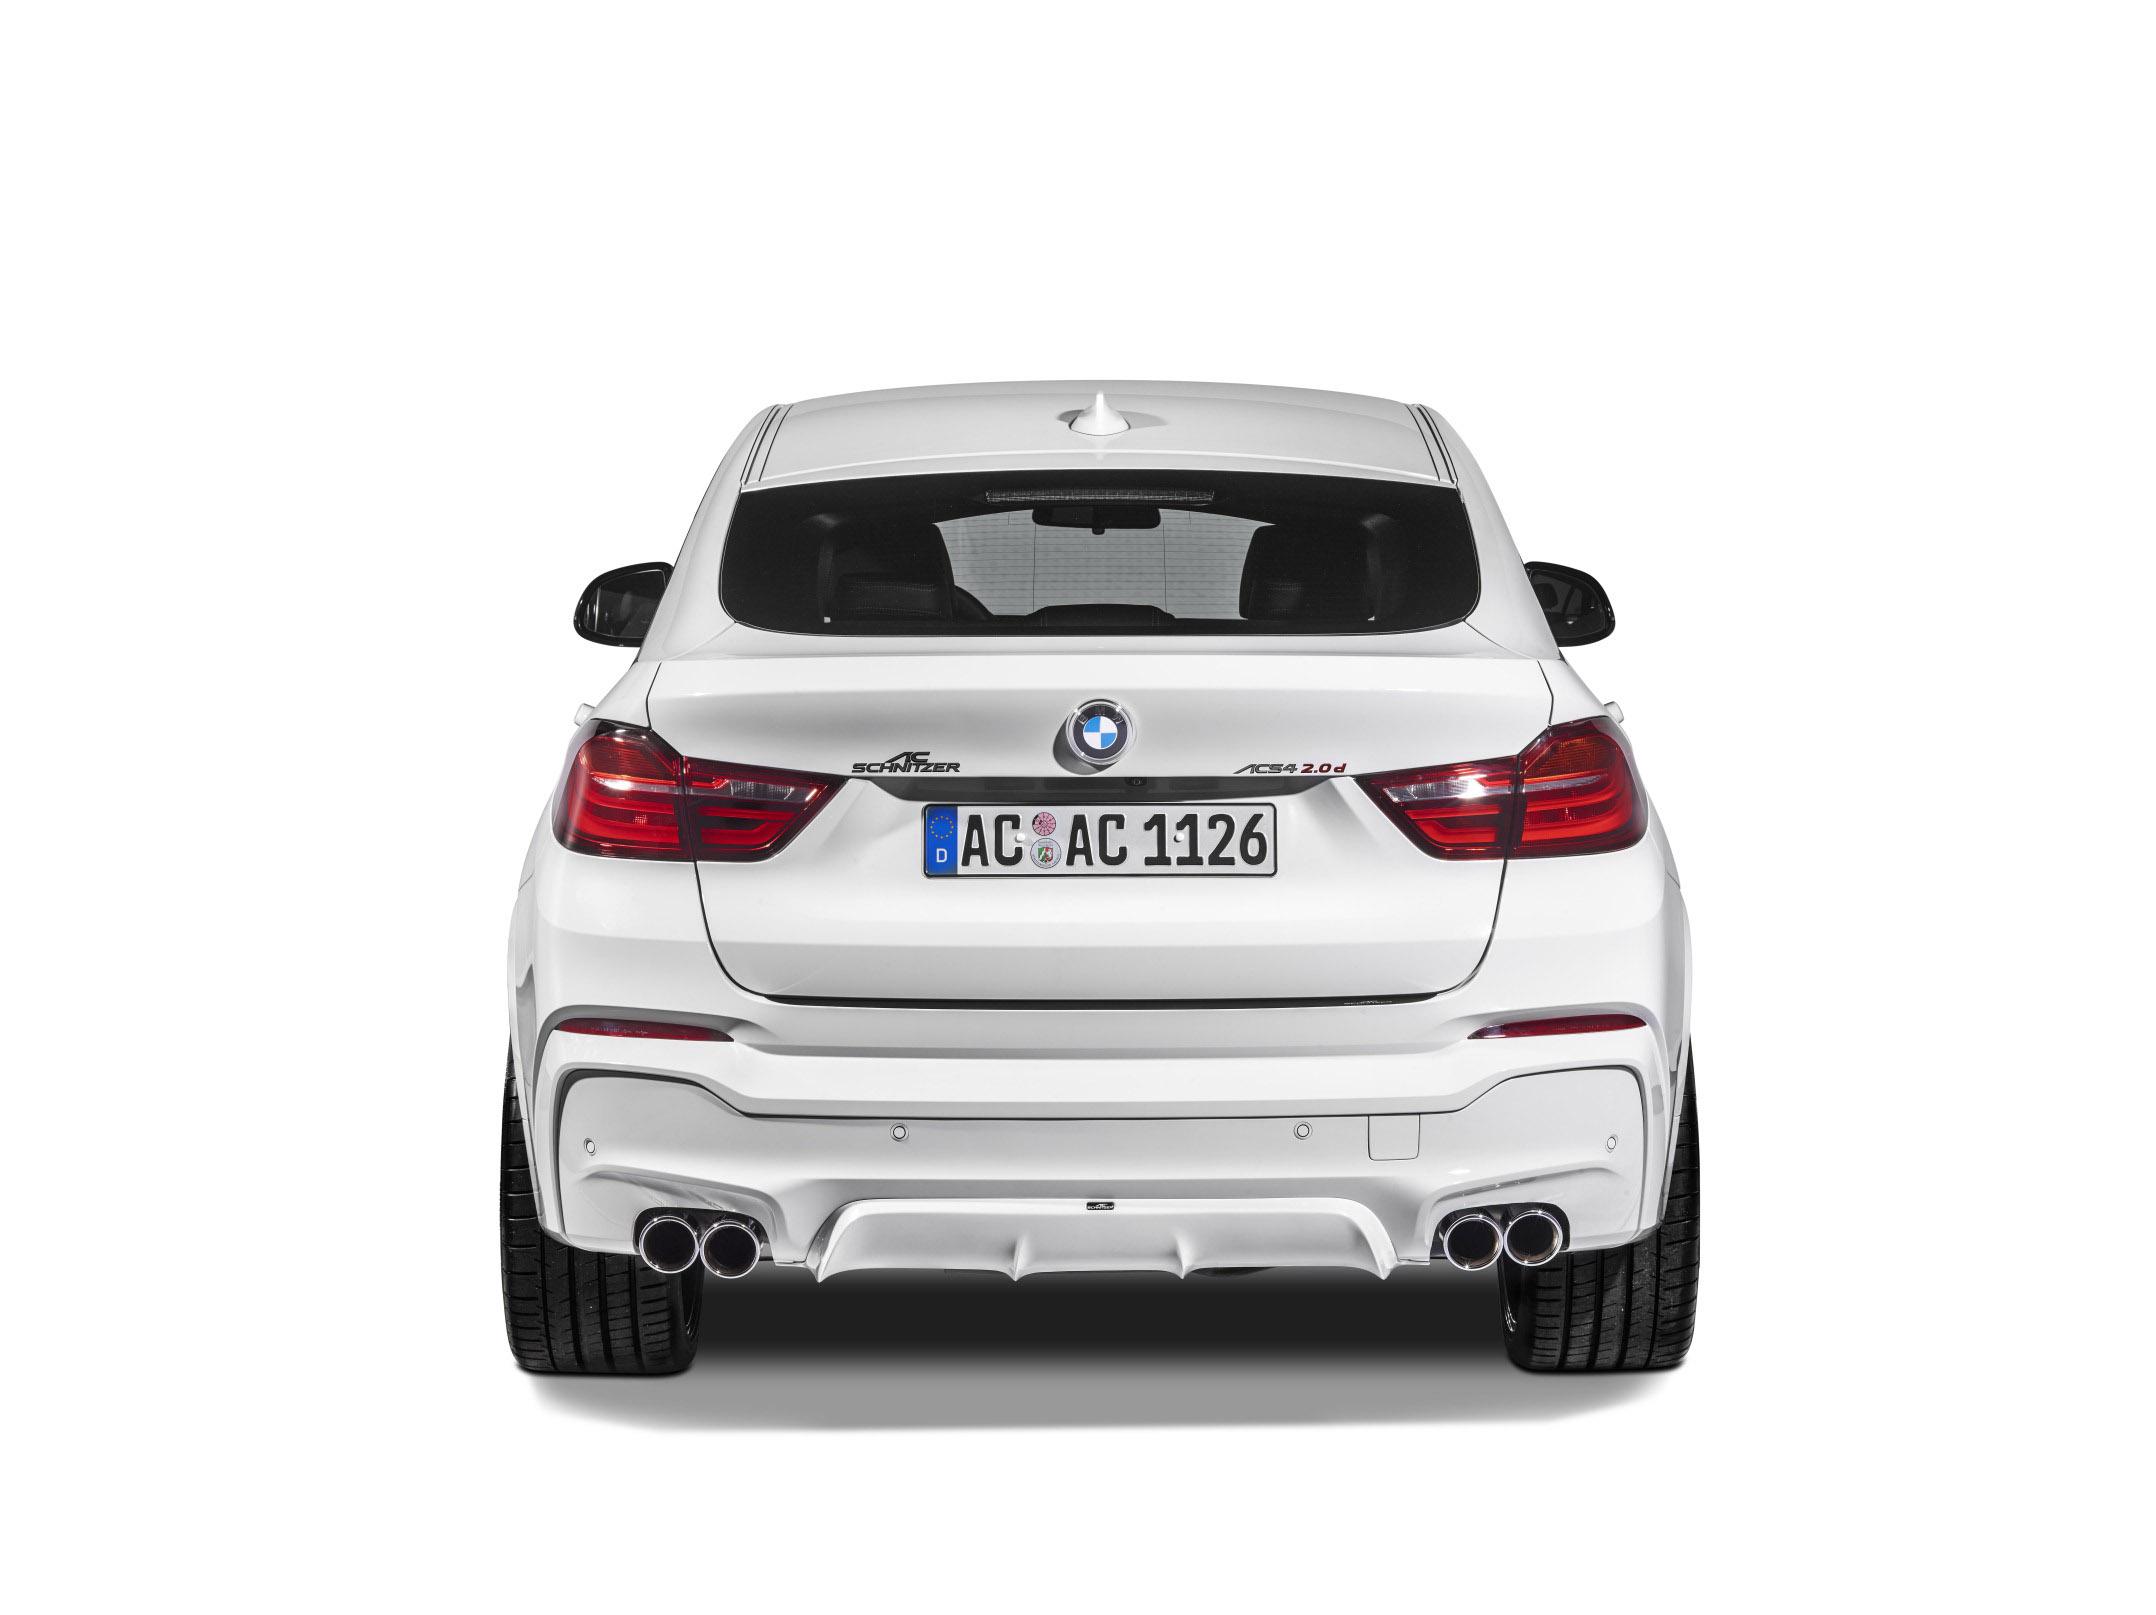 АС Шнитцер представлена на BMW х4 в невероятно спортивная версия - фотография №9